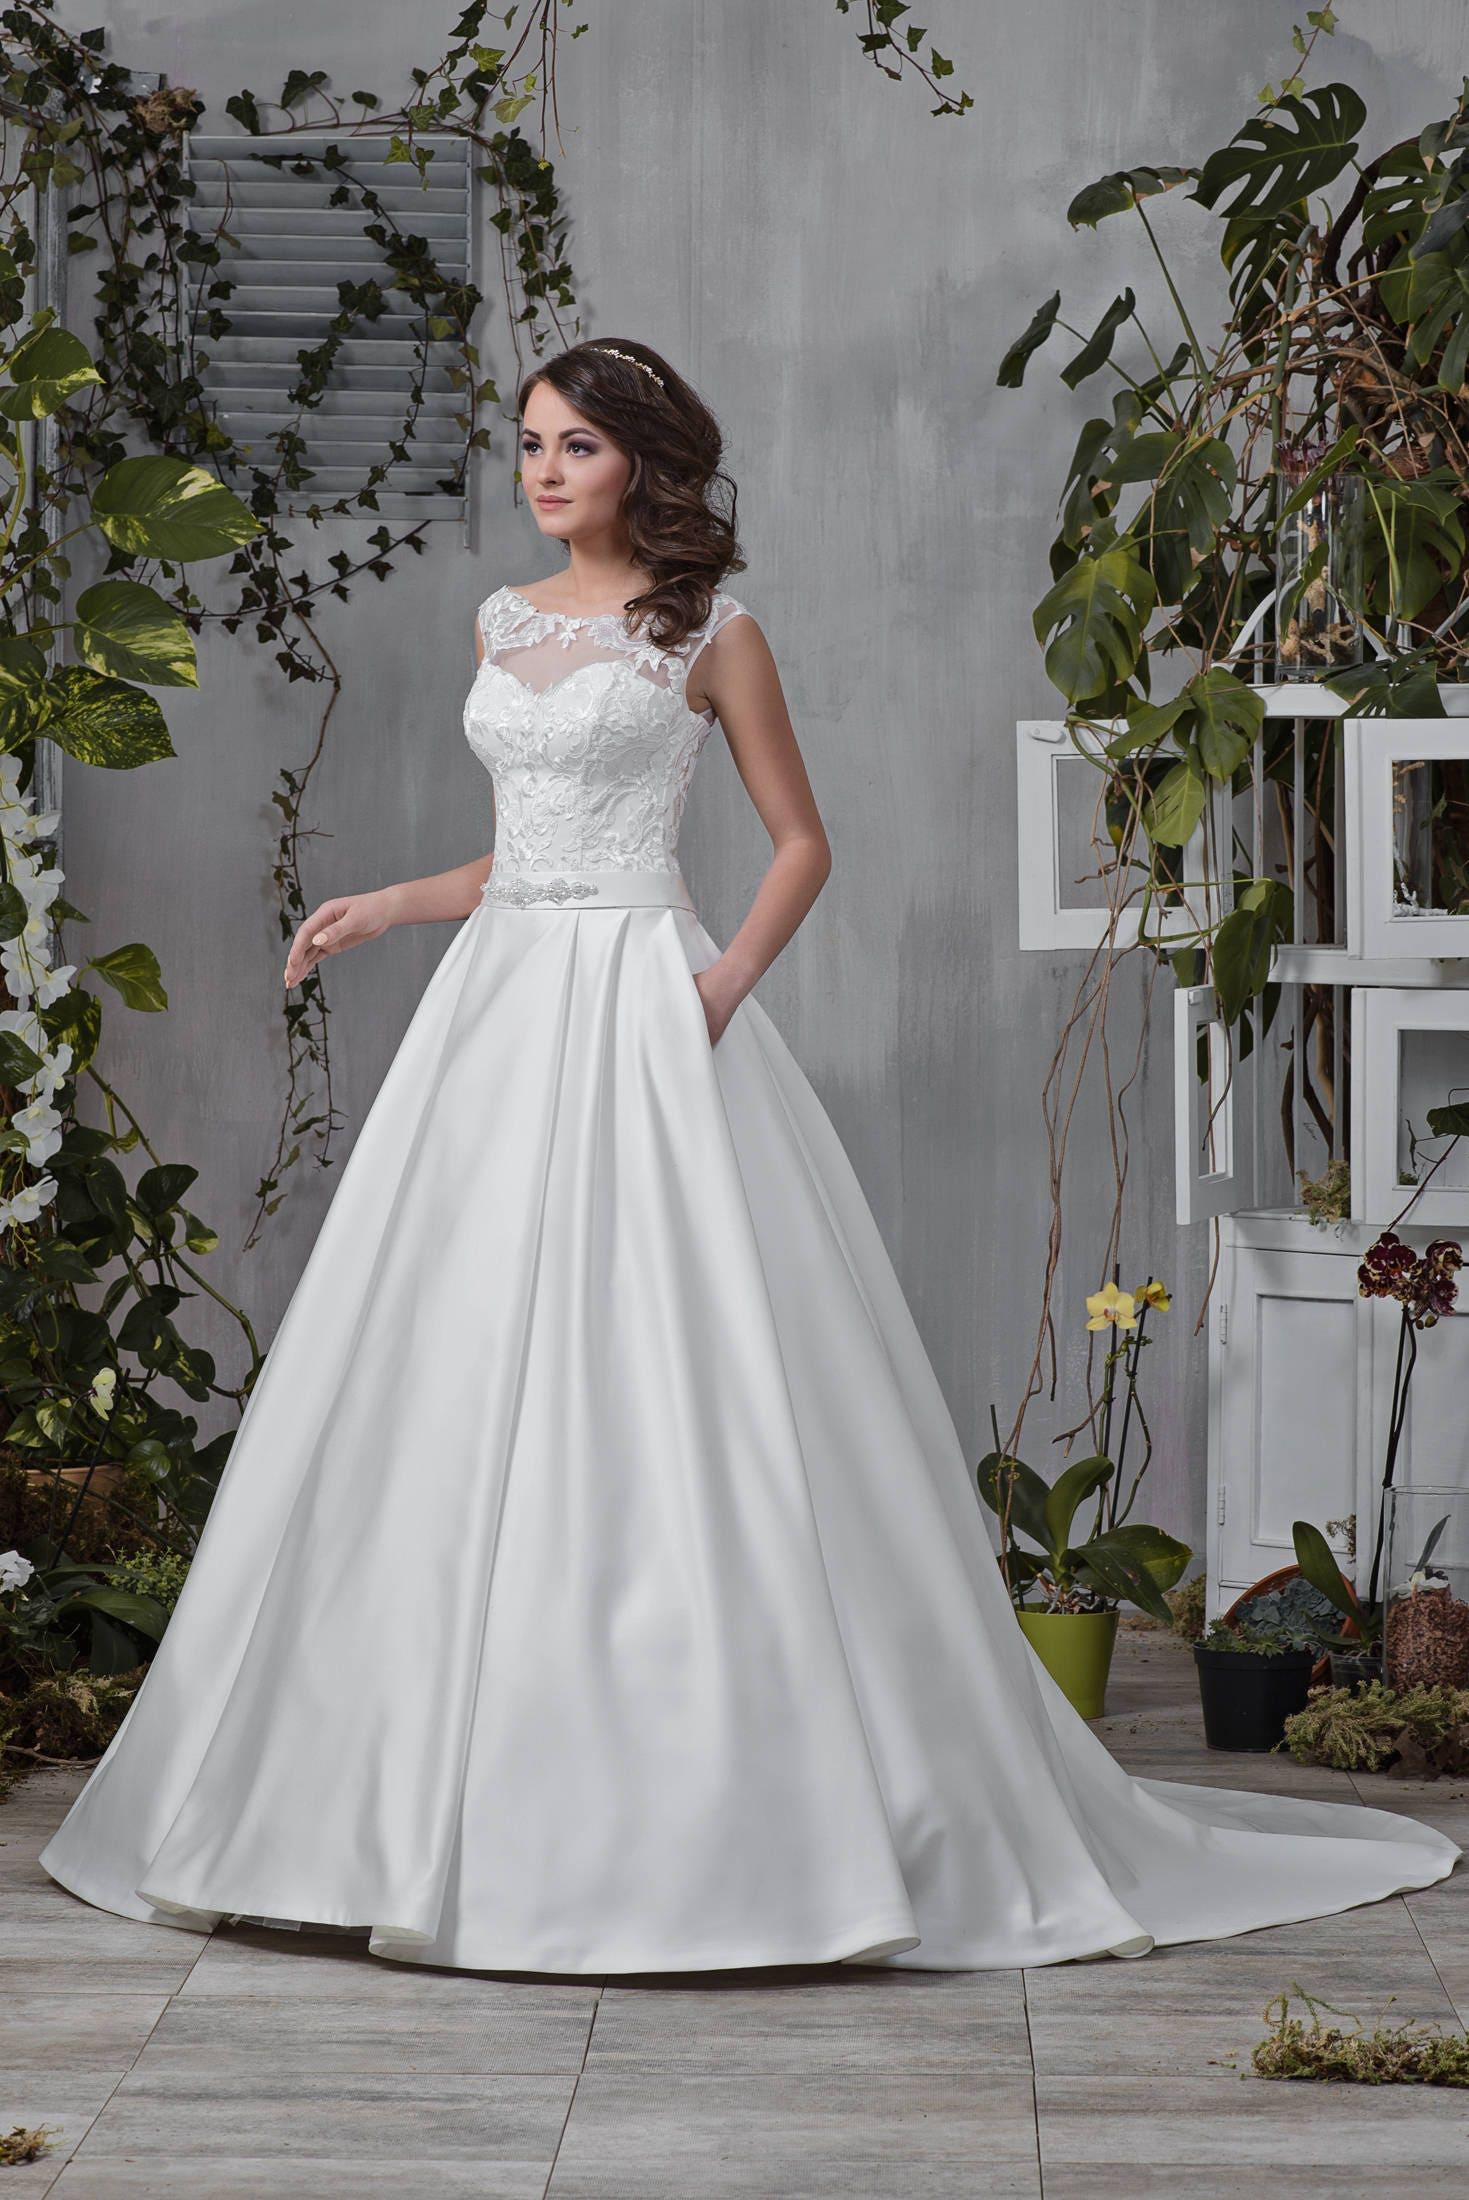 Heart Wedding Dresses